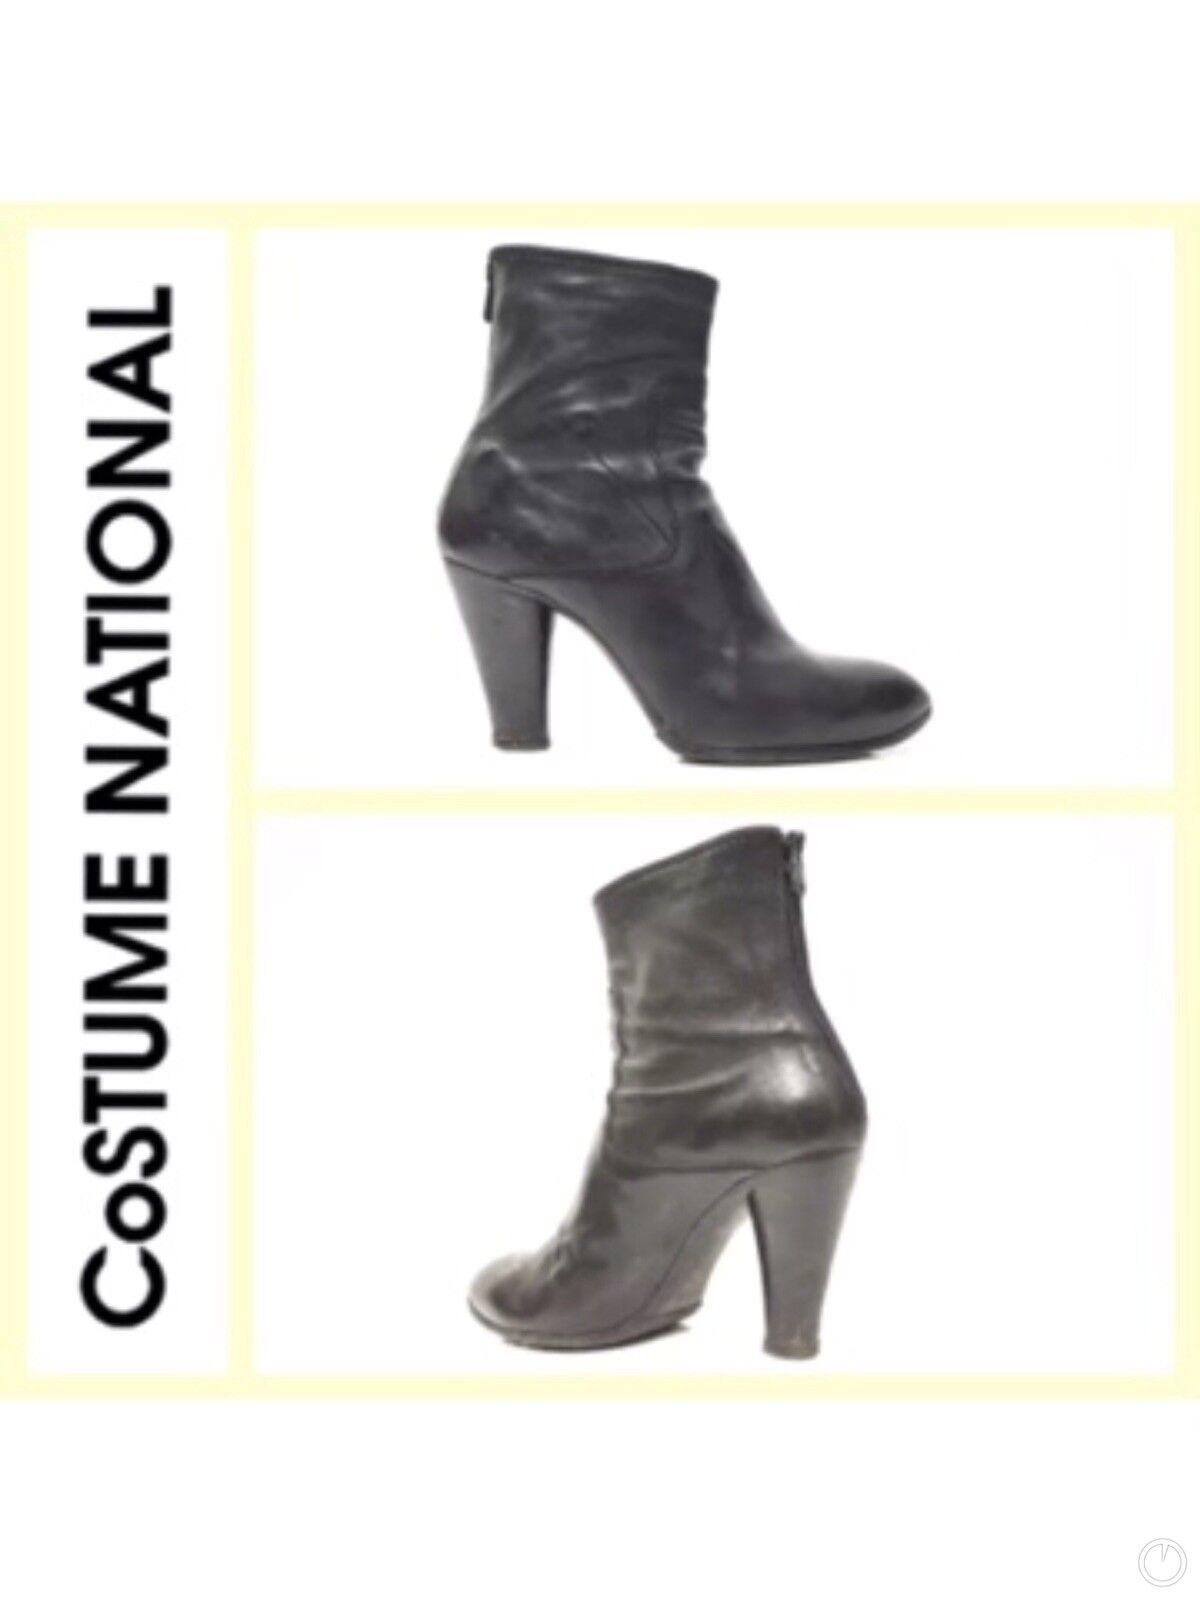 Costume National Women Black Short Boots SZ 40.5